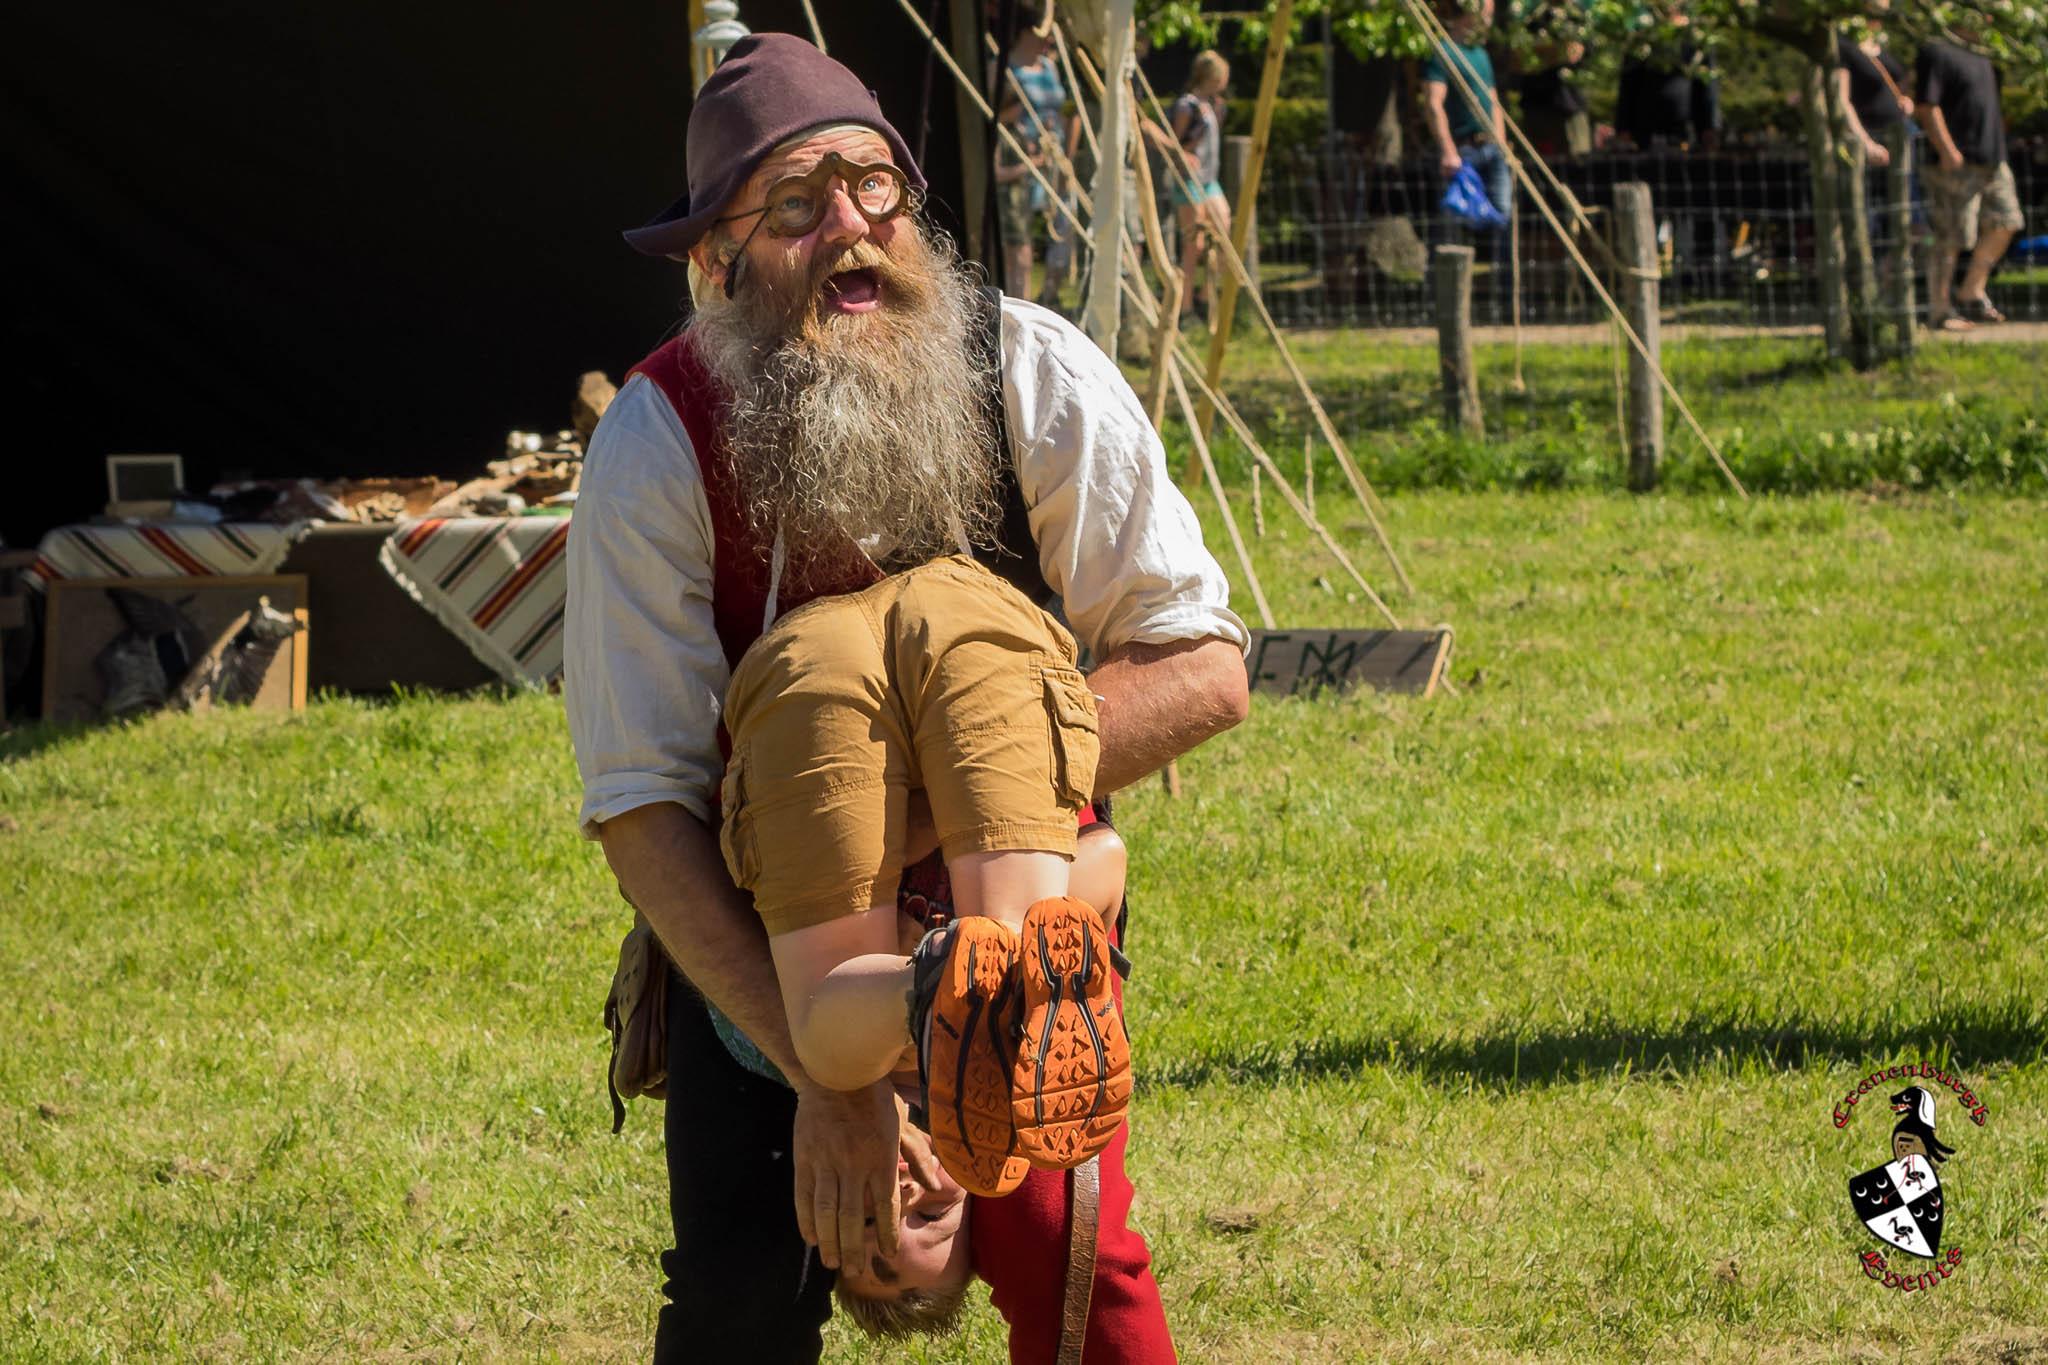 Middeleeuws-Festijn-Cannenburgh-2018-Algemeen-Ellen-la-Faille-23